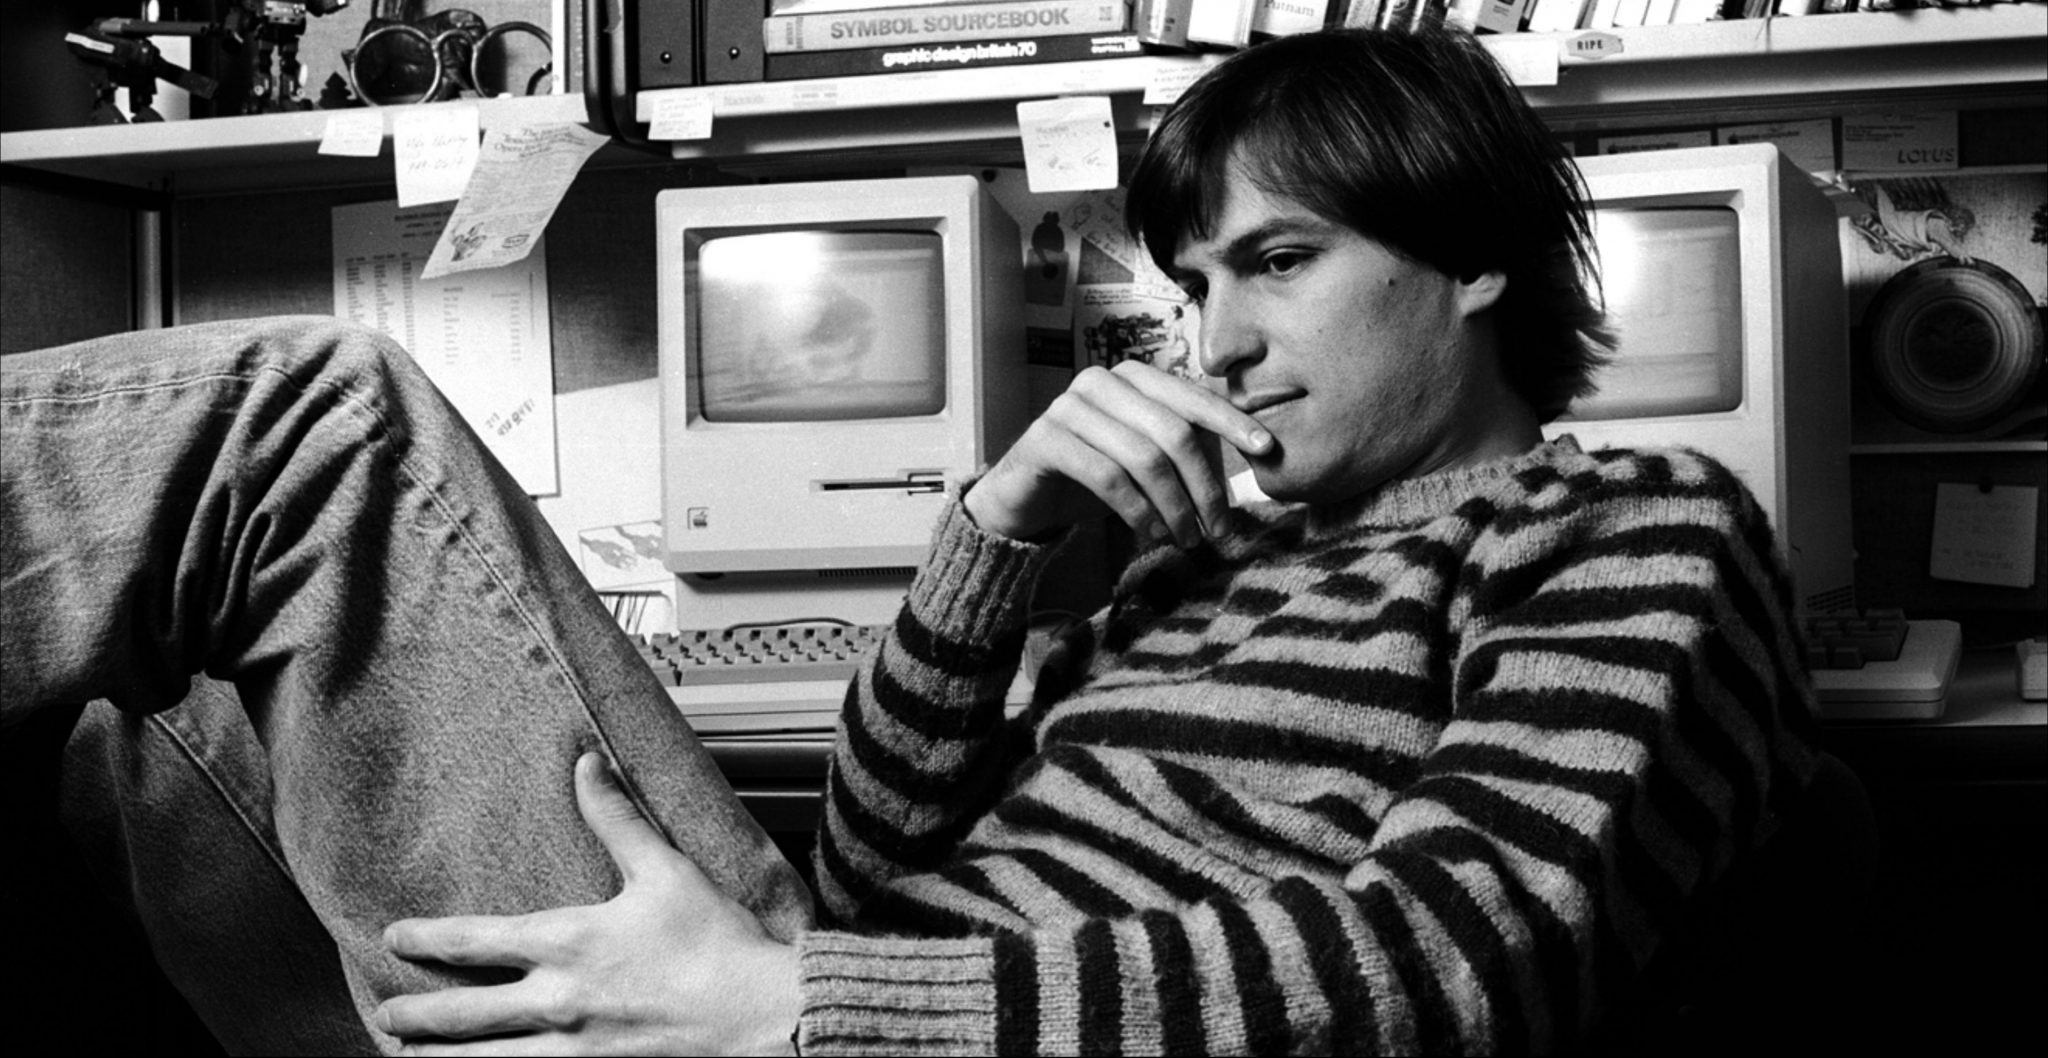 Danny Boyle's Steve Jobs biopic enters production